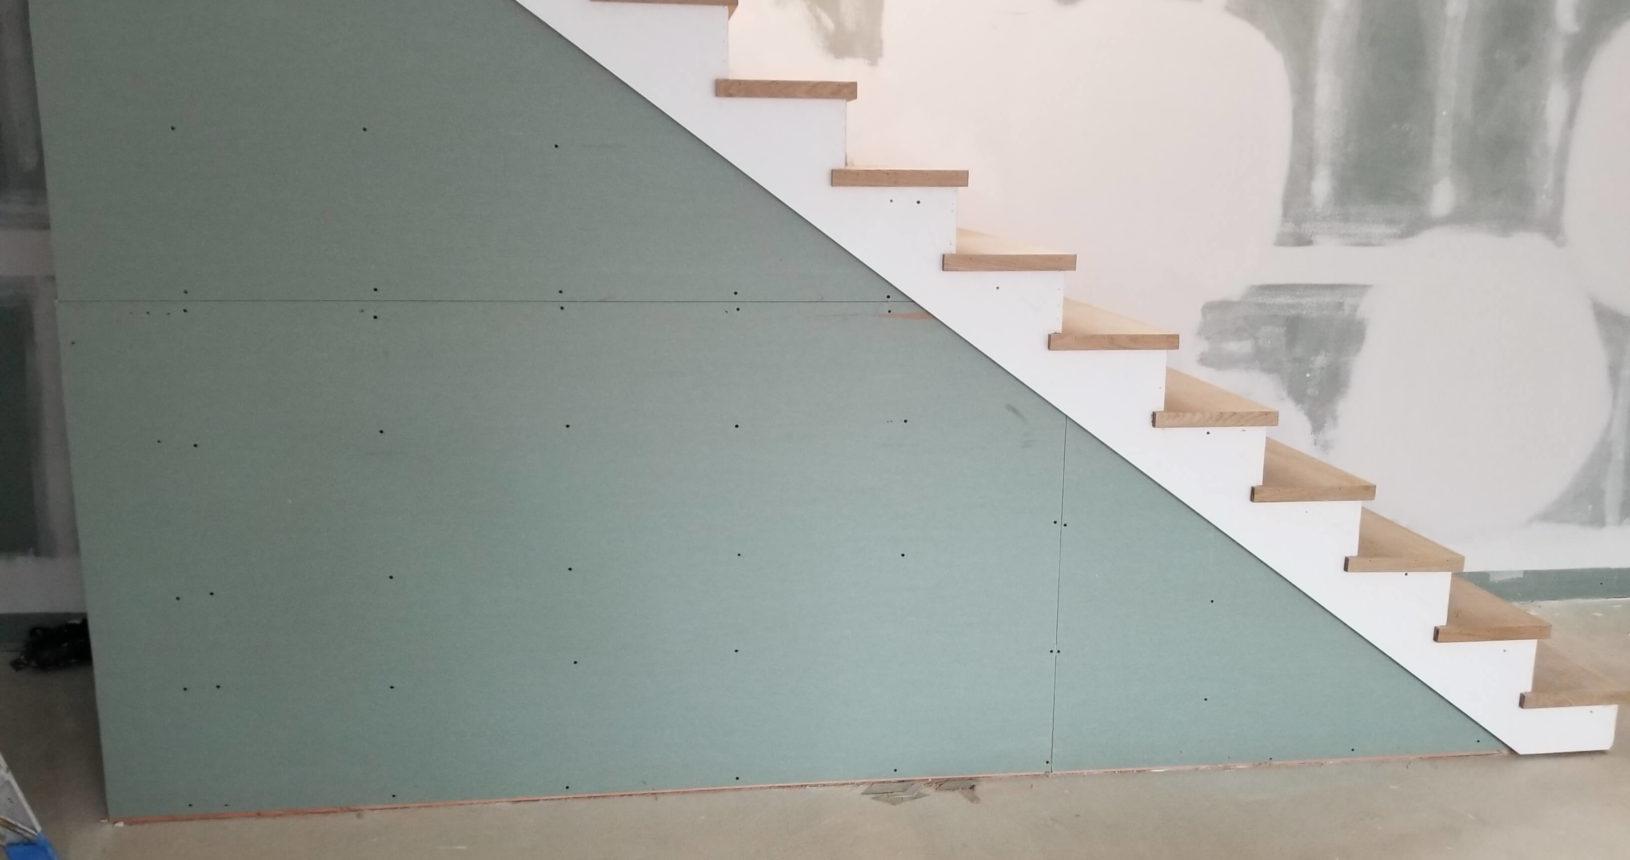 Chameleon Painting Inc. - Sheetrock Repairs